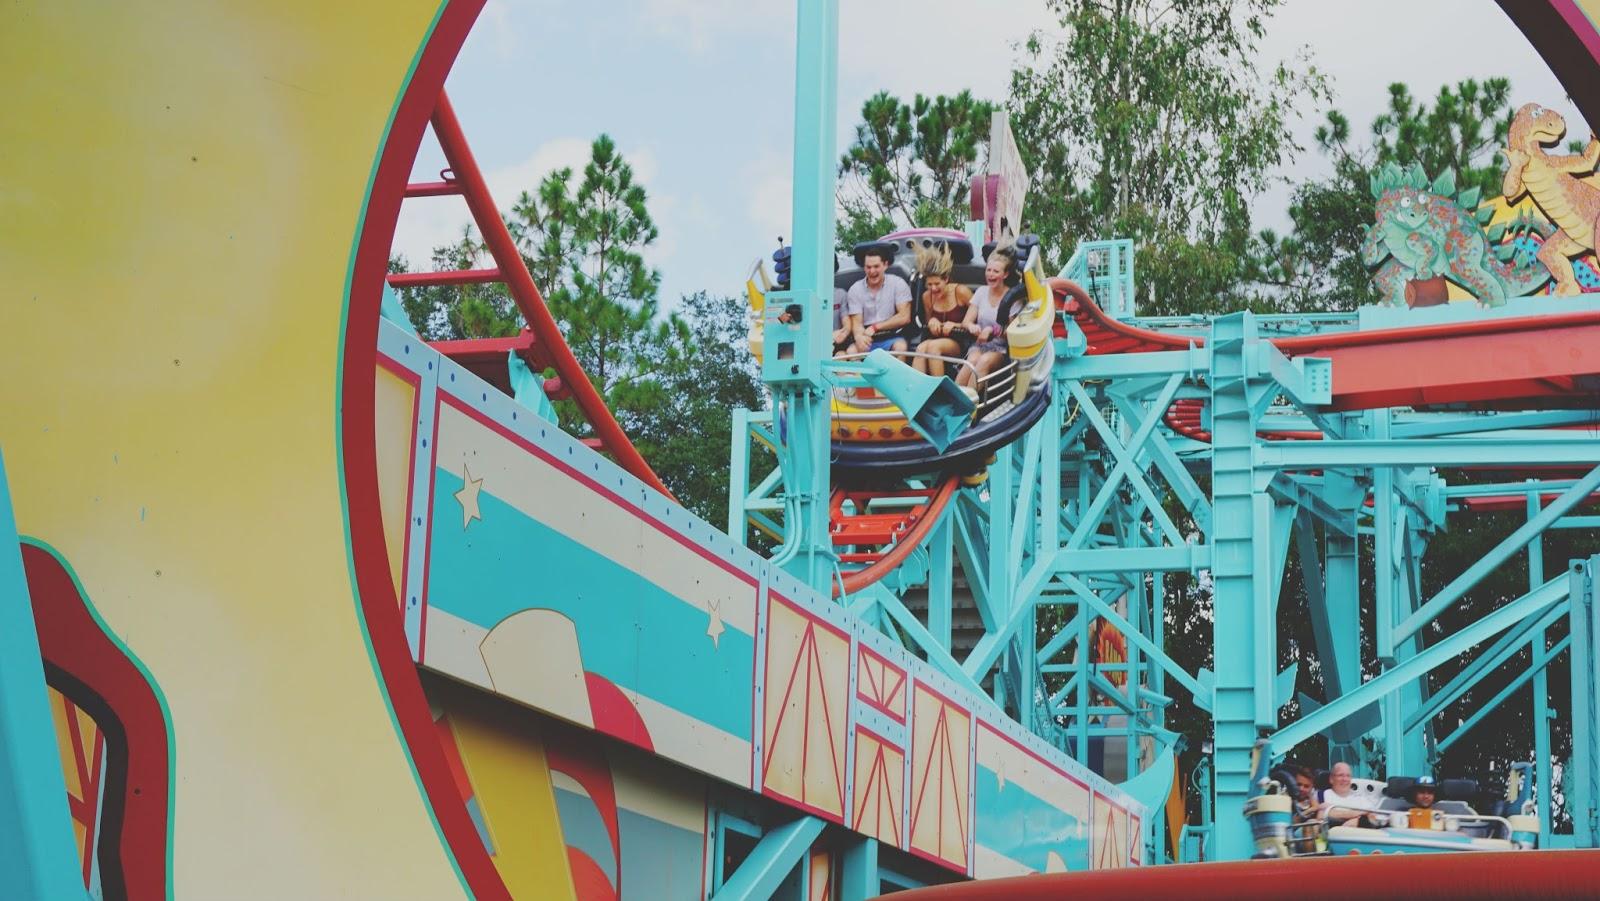 Primeval Whirl at Animal Kingdom in Disney World, Florida